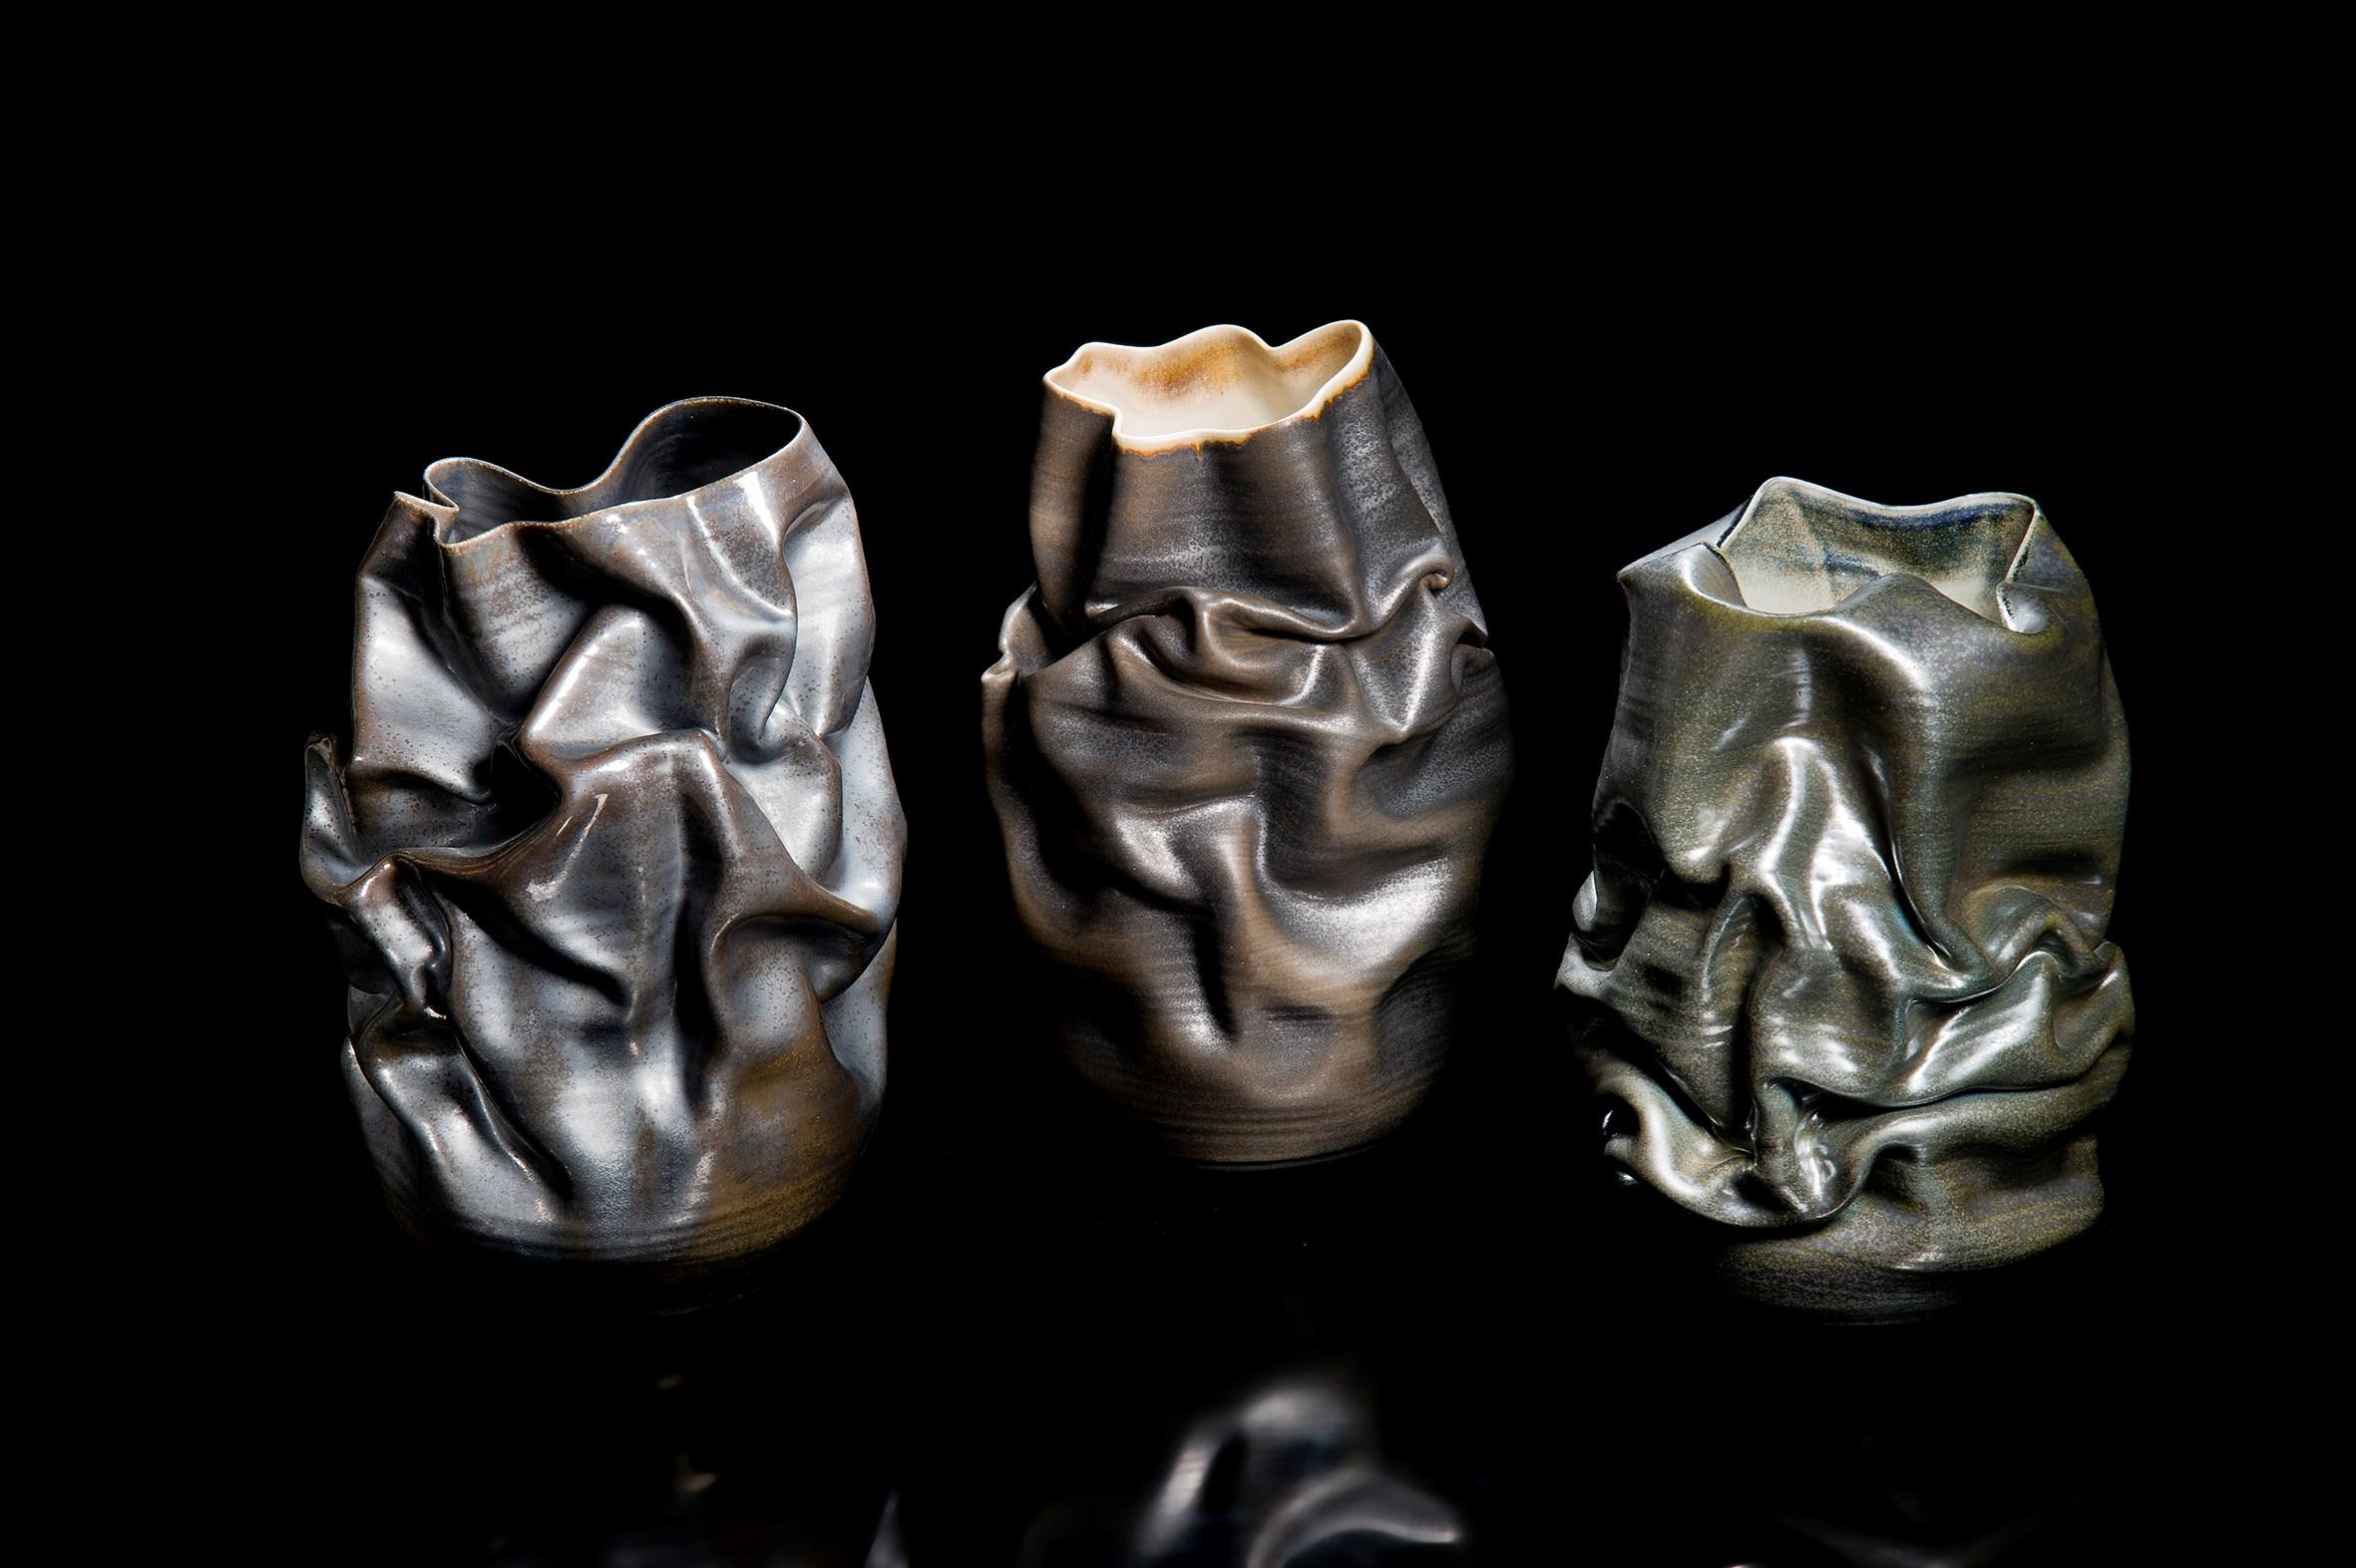 Black Crumpled Form ceramic vase sculpture by Nicholas Arroyave-Portela